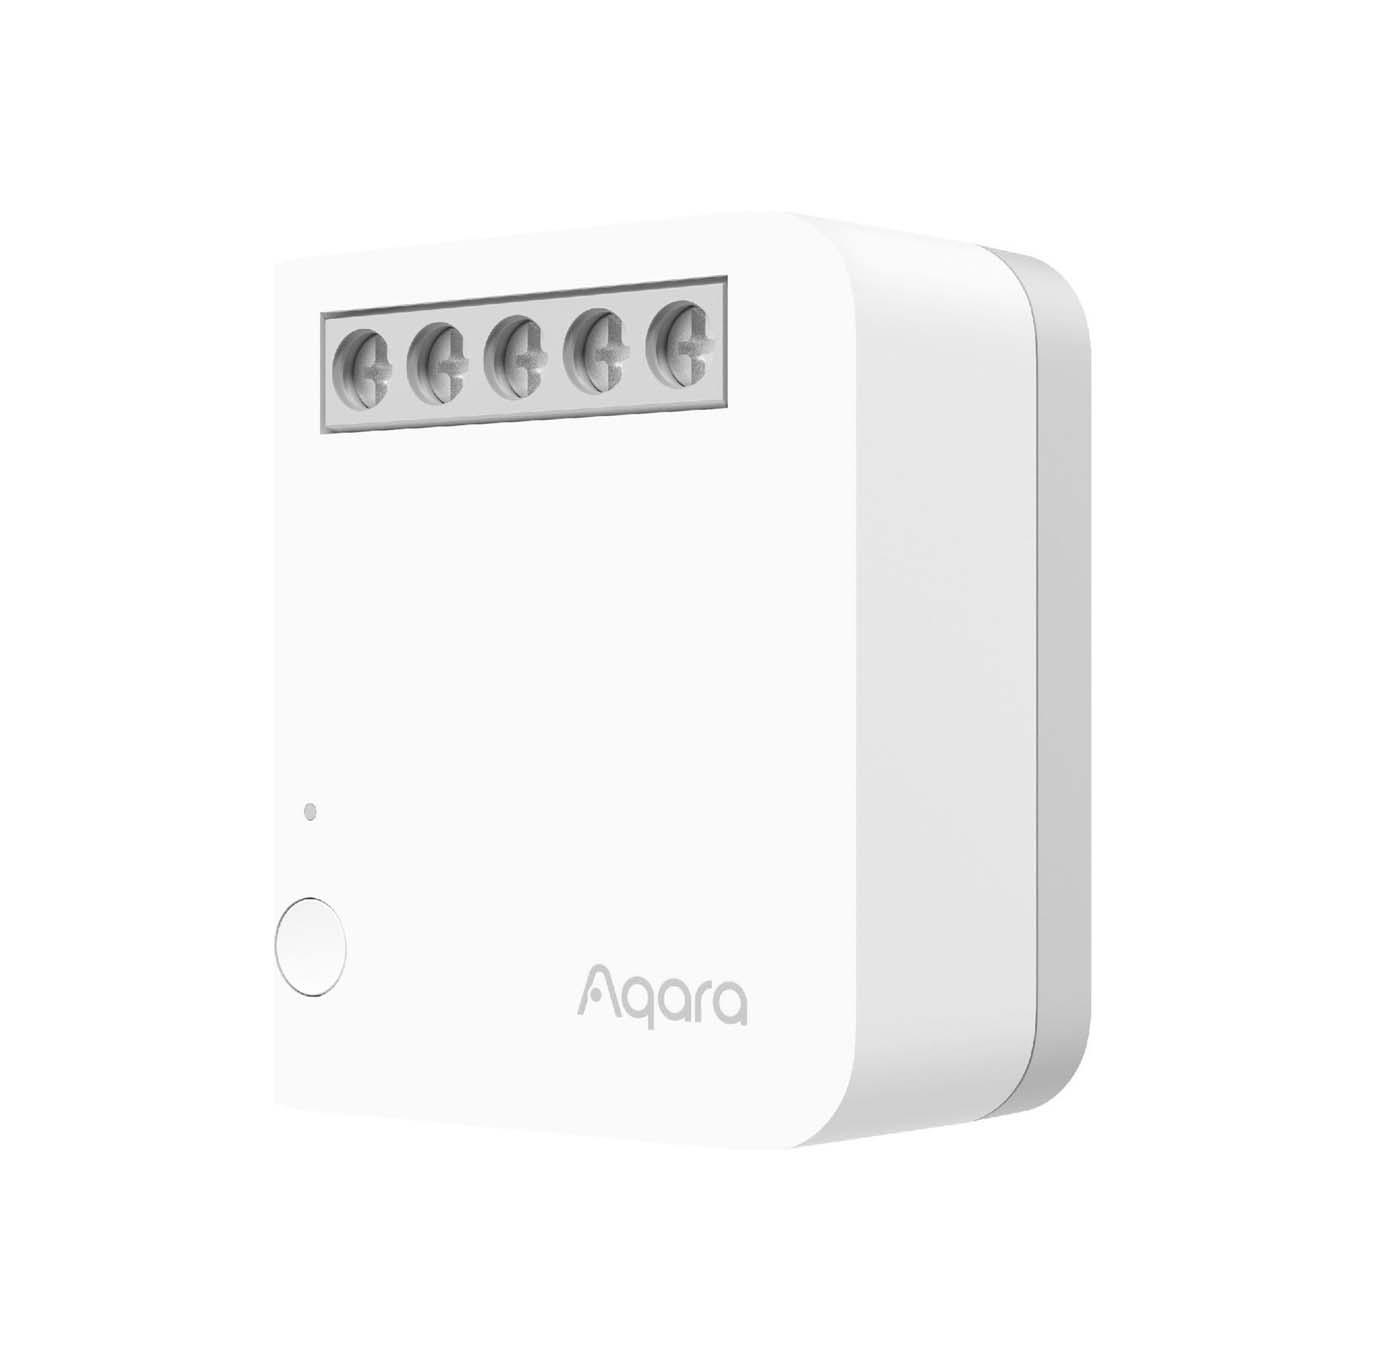 Xiaomi Aqara Single Switch Module T1 (With Neutral) SSM-U01 (2 χρόνια εγγύηση)